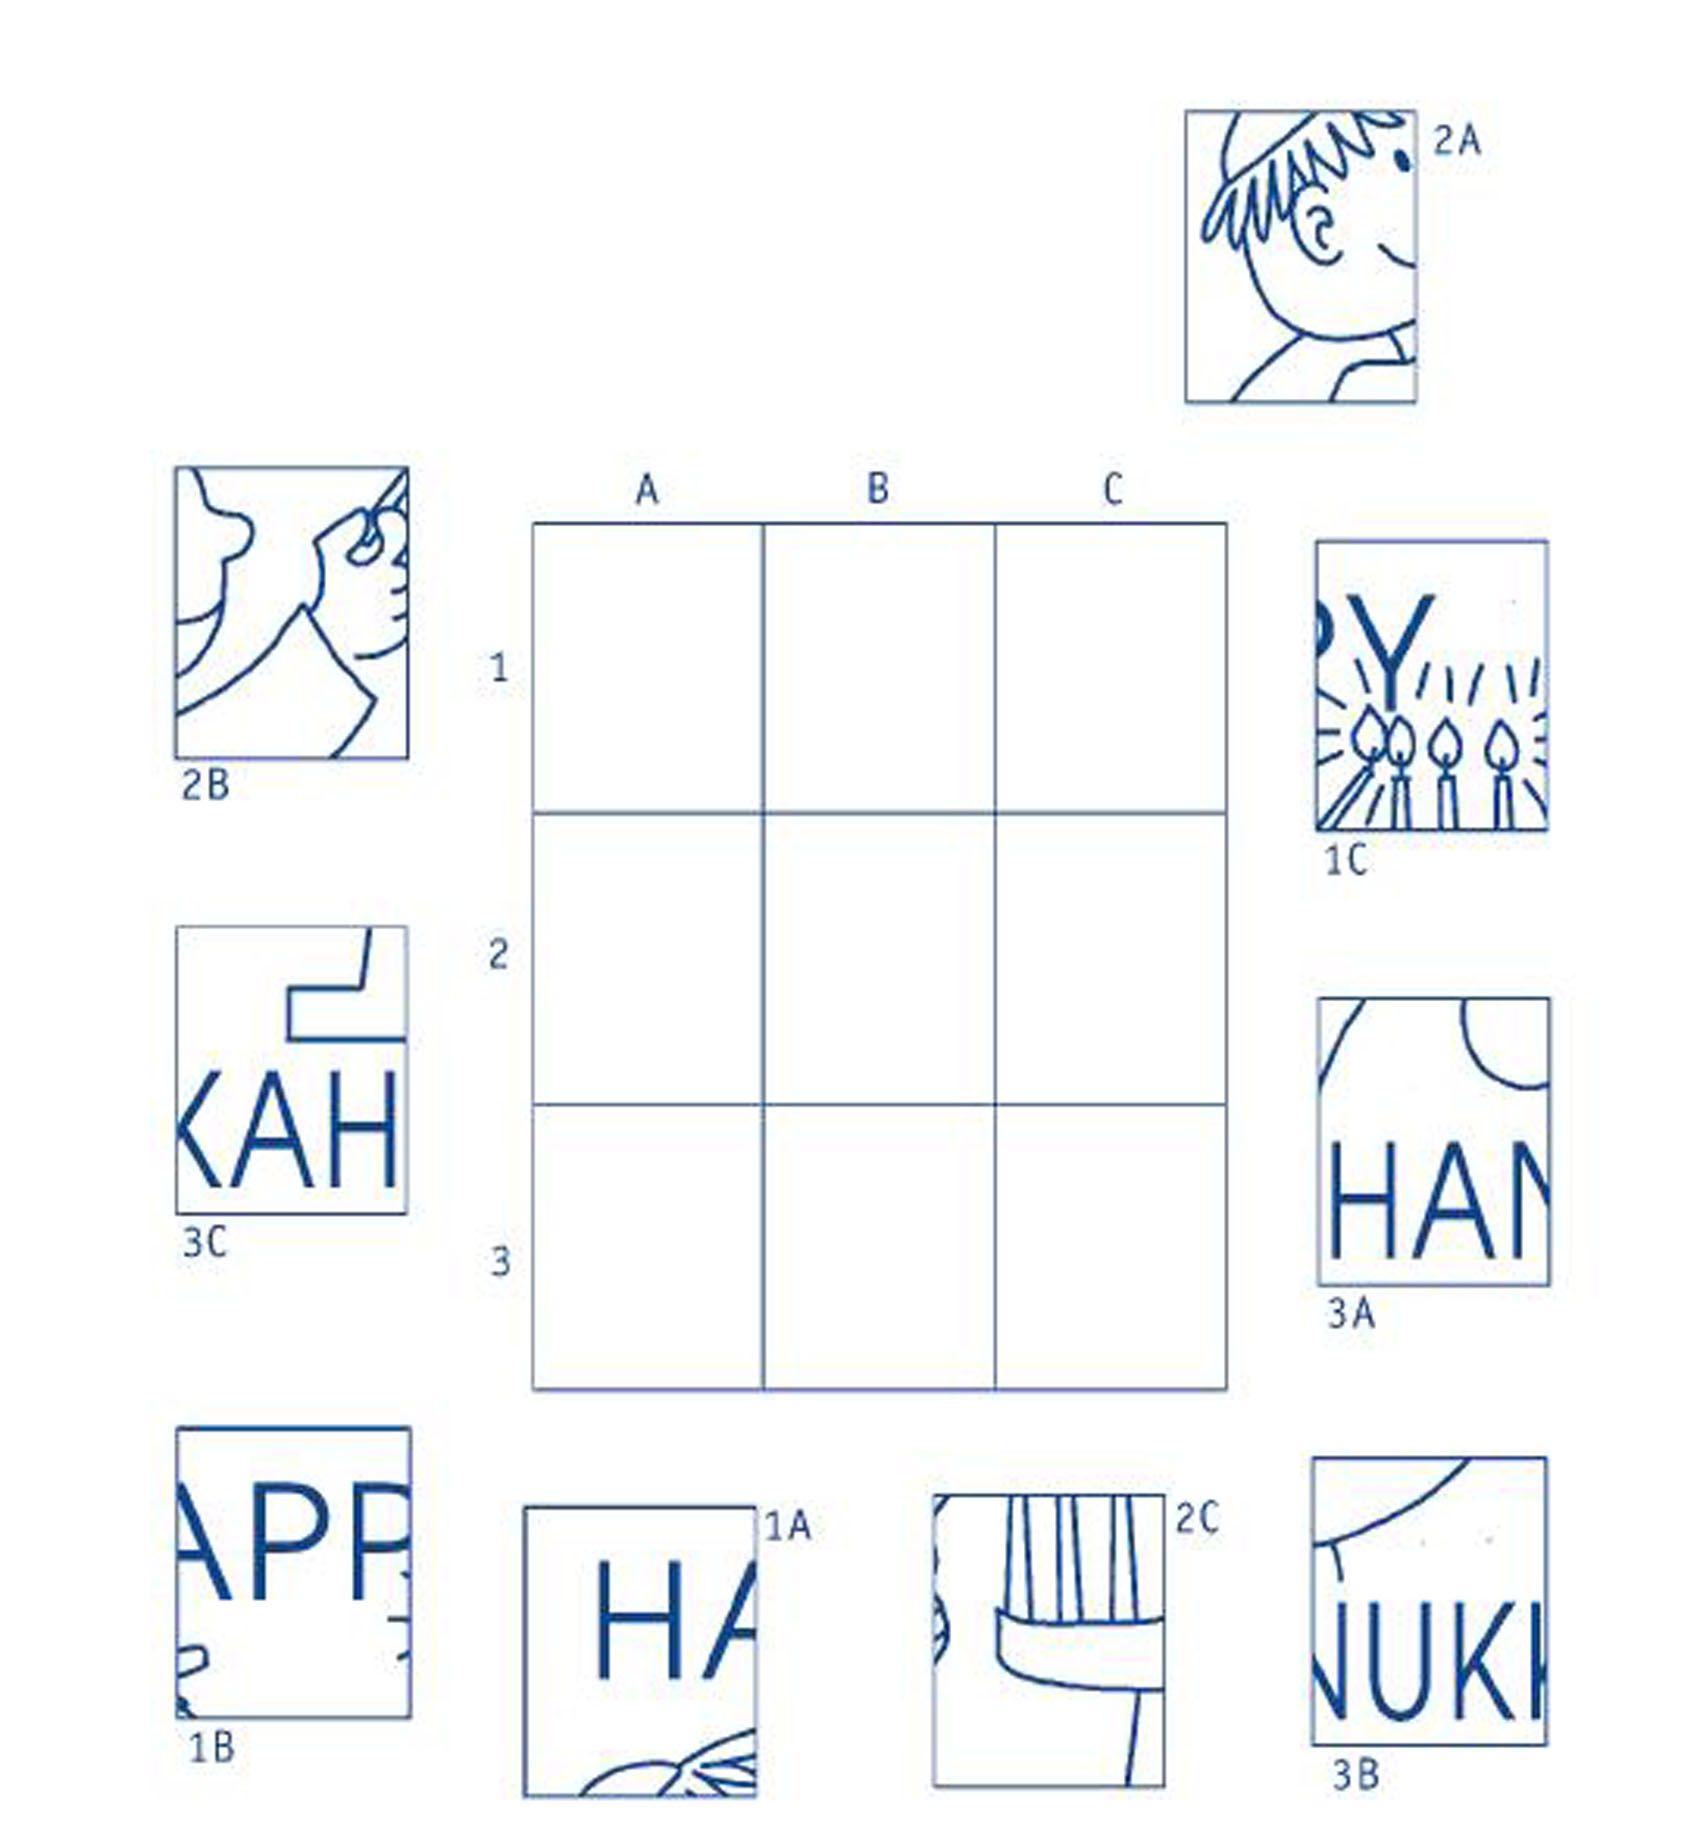 Uncategorized Hanukkah Worksheets hanukkah worksheets copy card puzzles and activities for kids